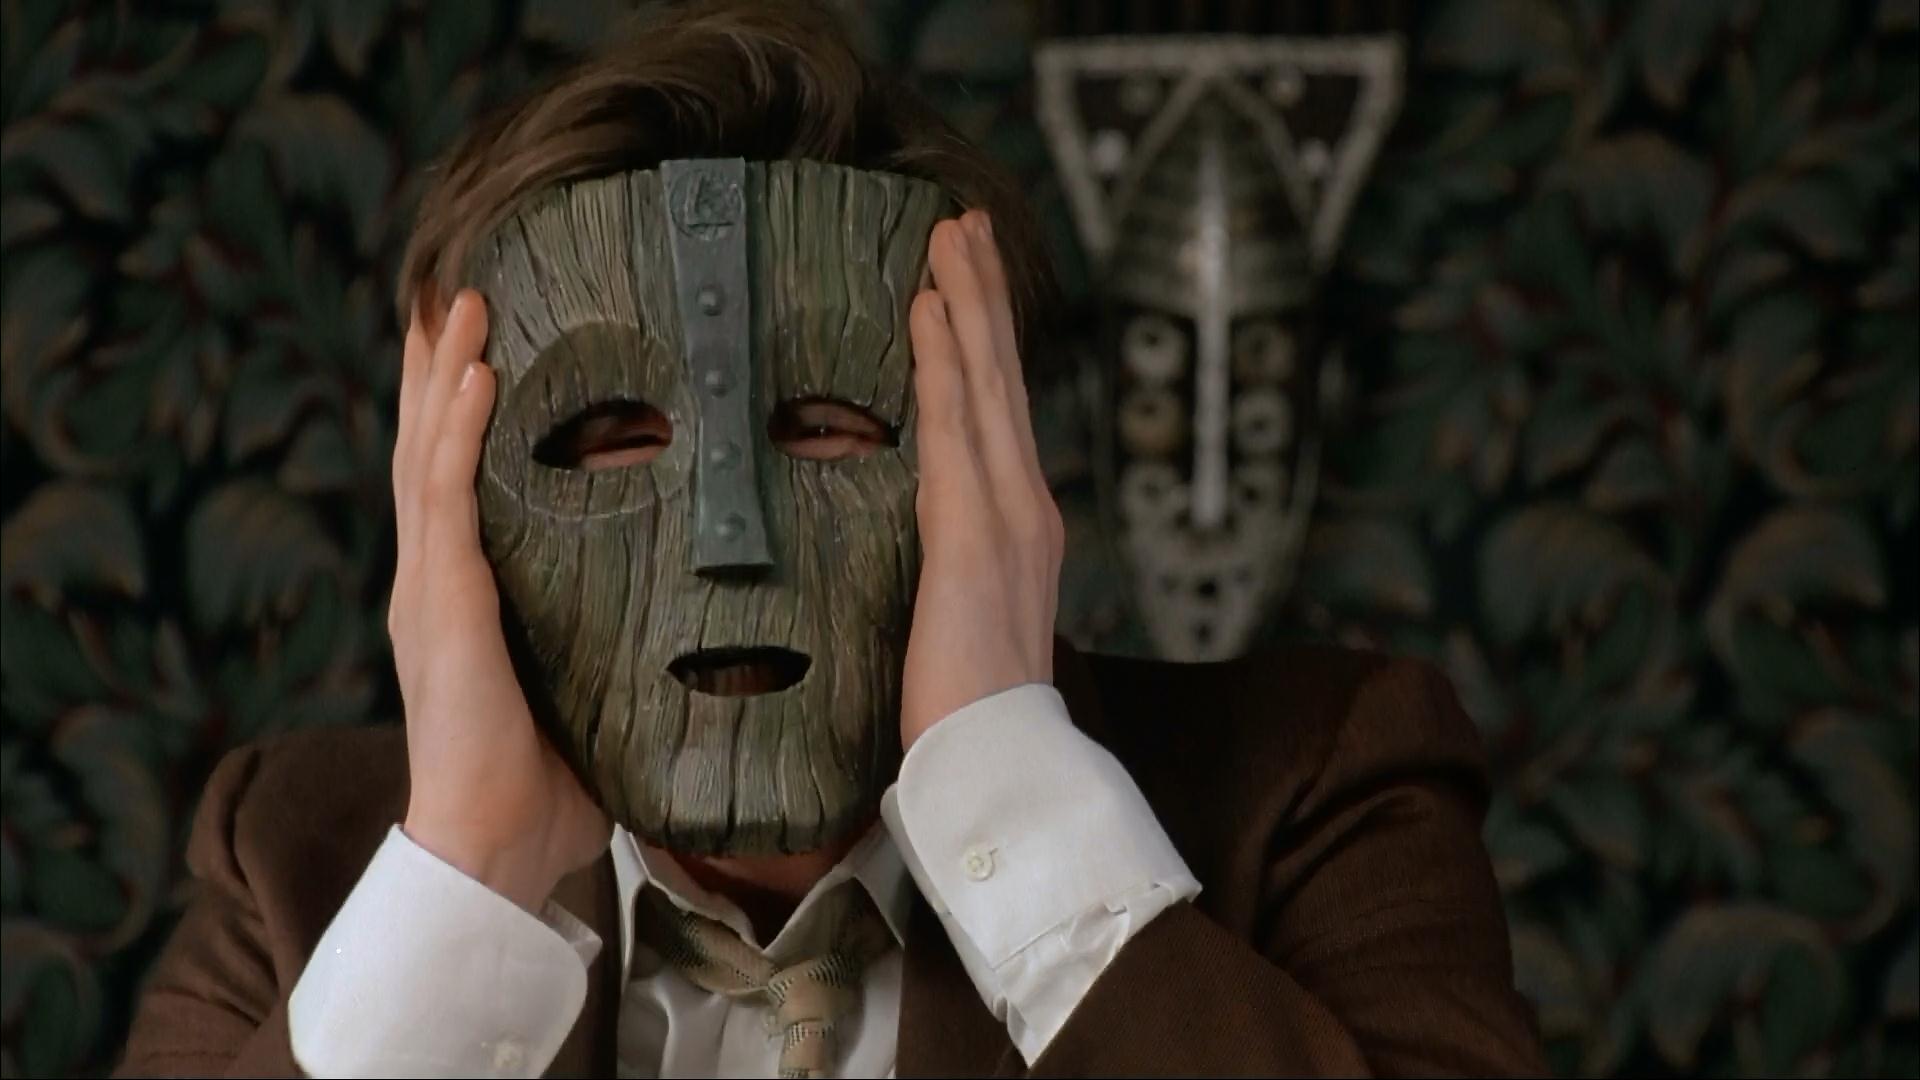 the_mask_movie___original_mask_color_by_hyperomegasonic-d5elont